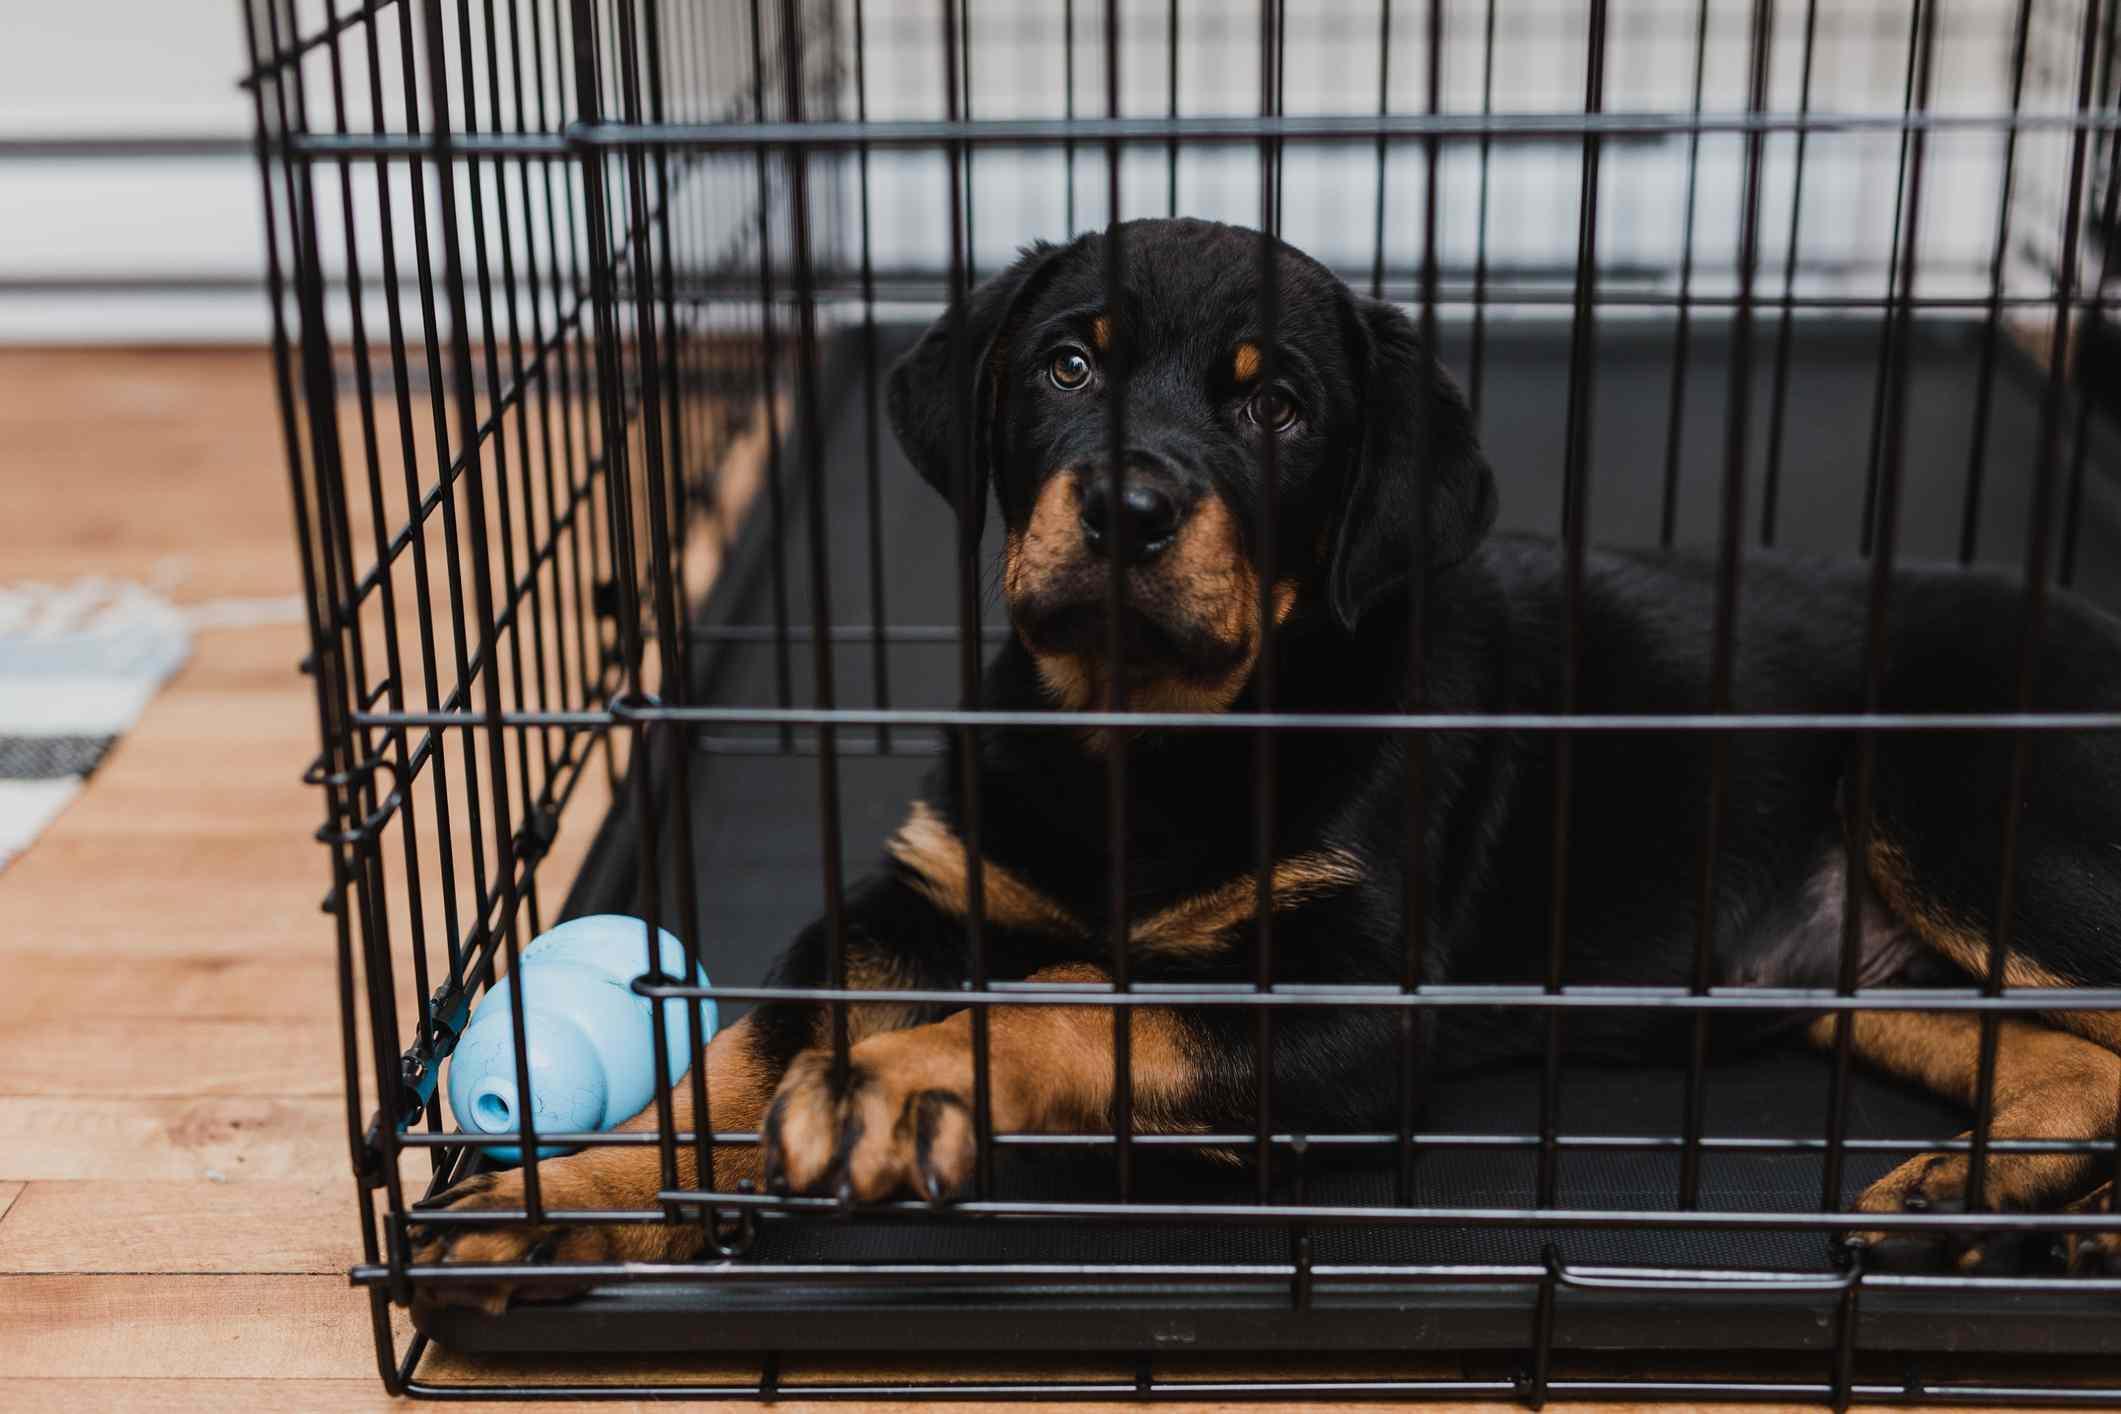 Cachorro Rottweiler dentro de su caja